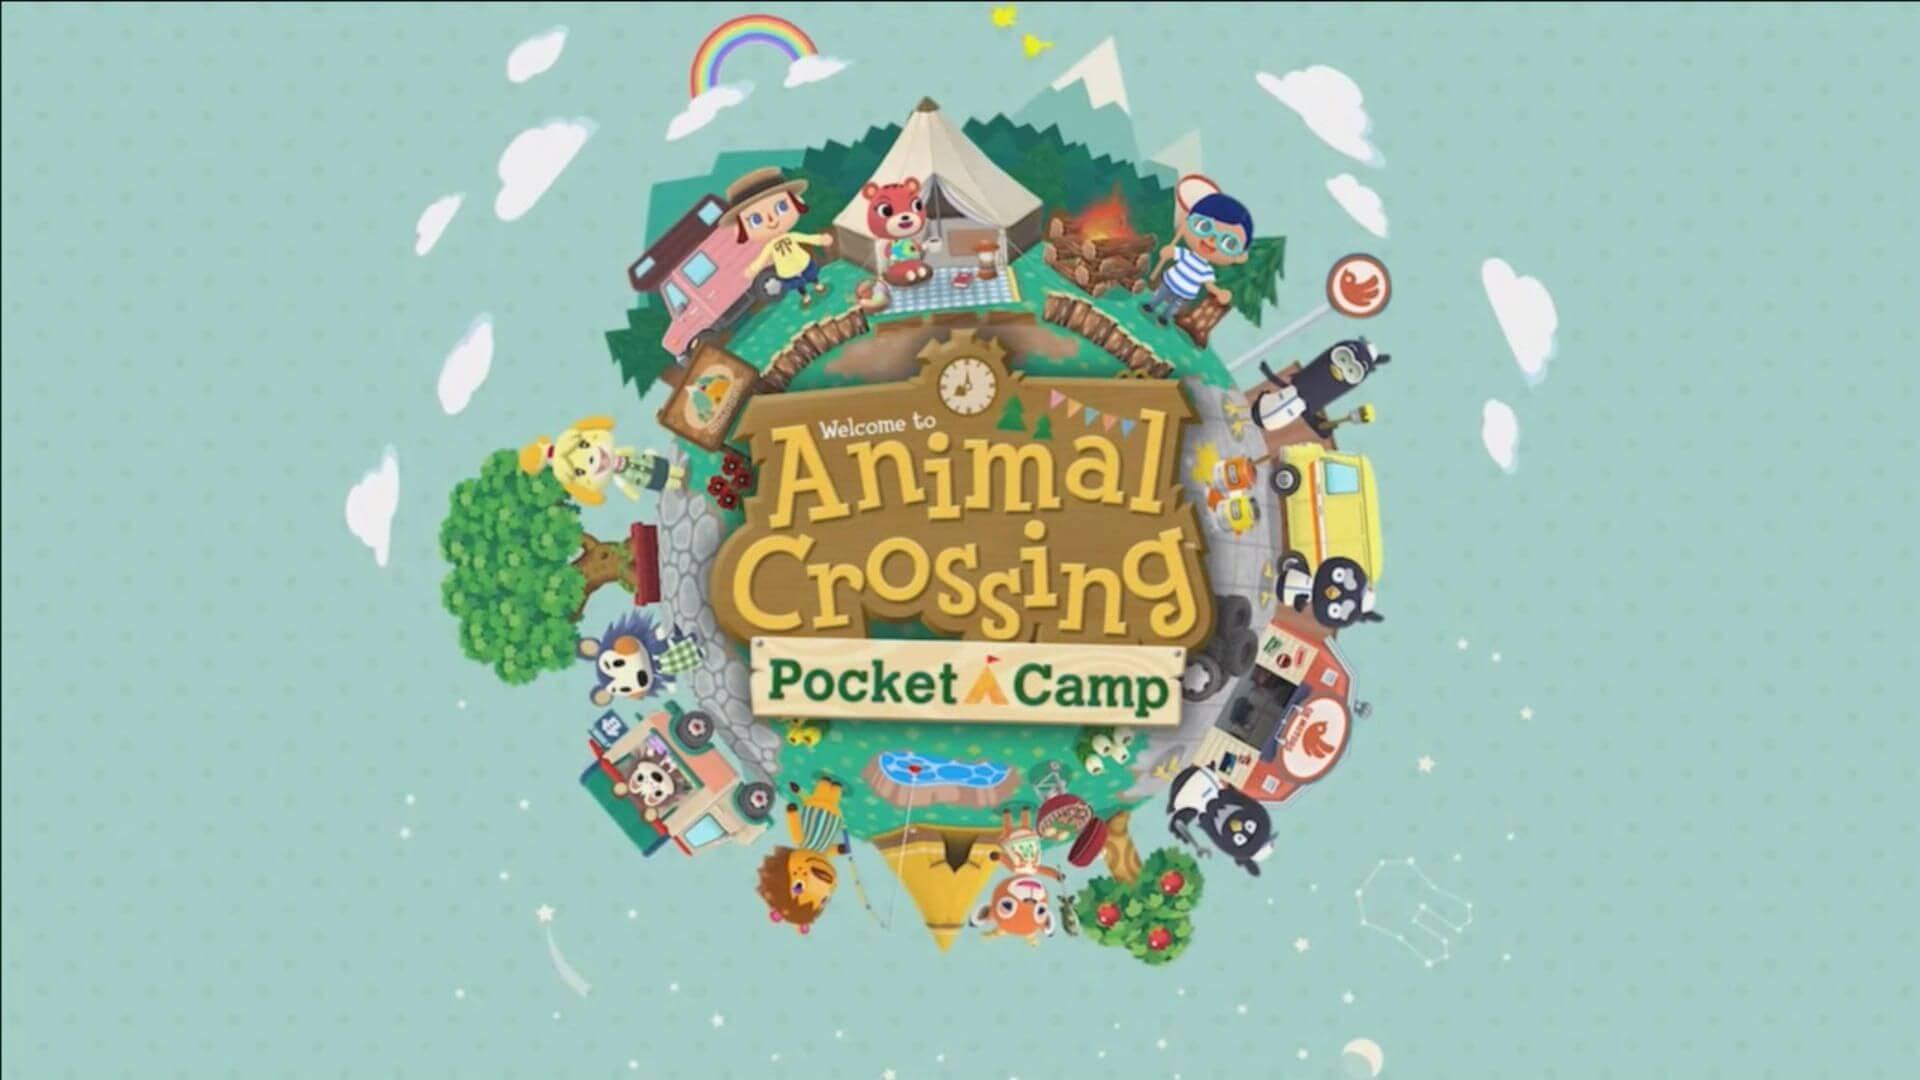 Animal Crossing: Pocket Camp, Nintendo